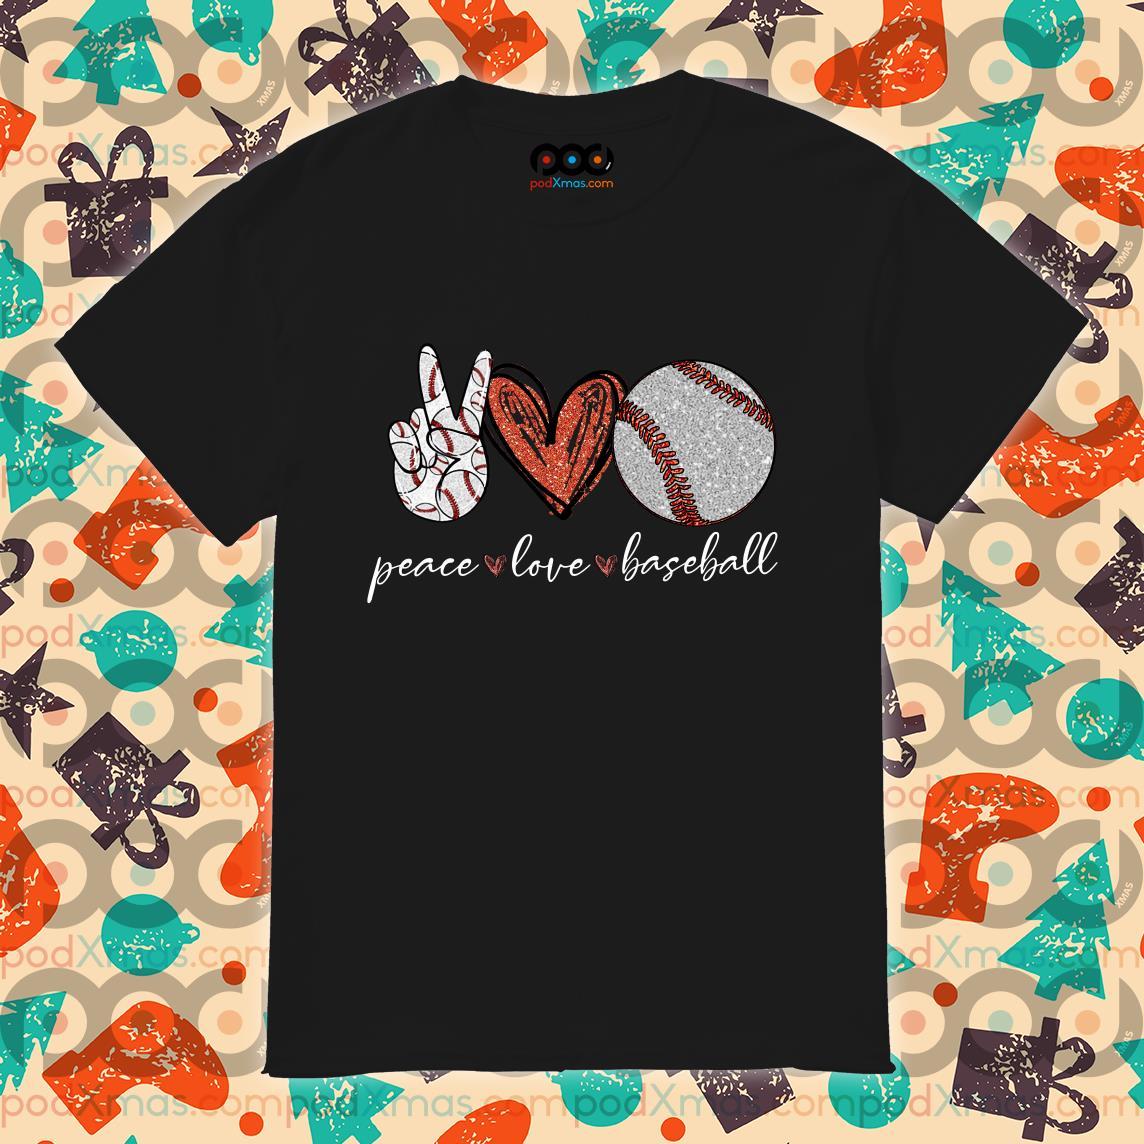 Peace love baseball shirt